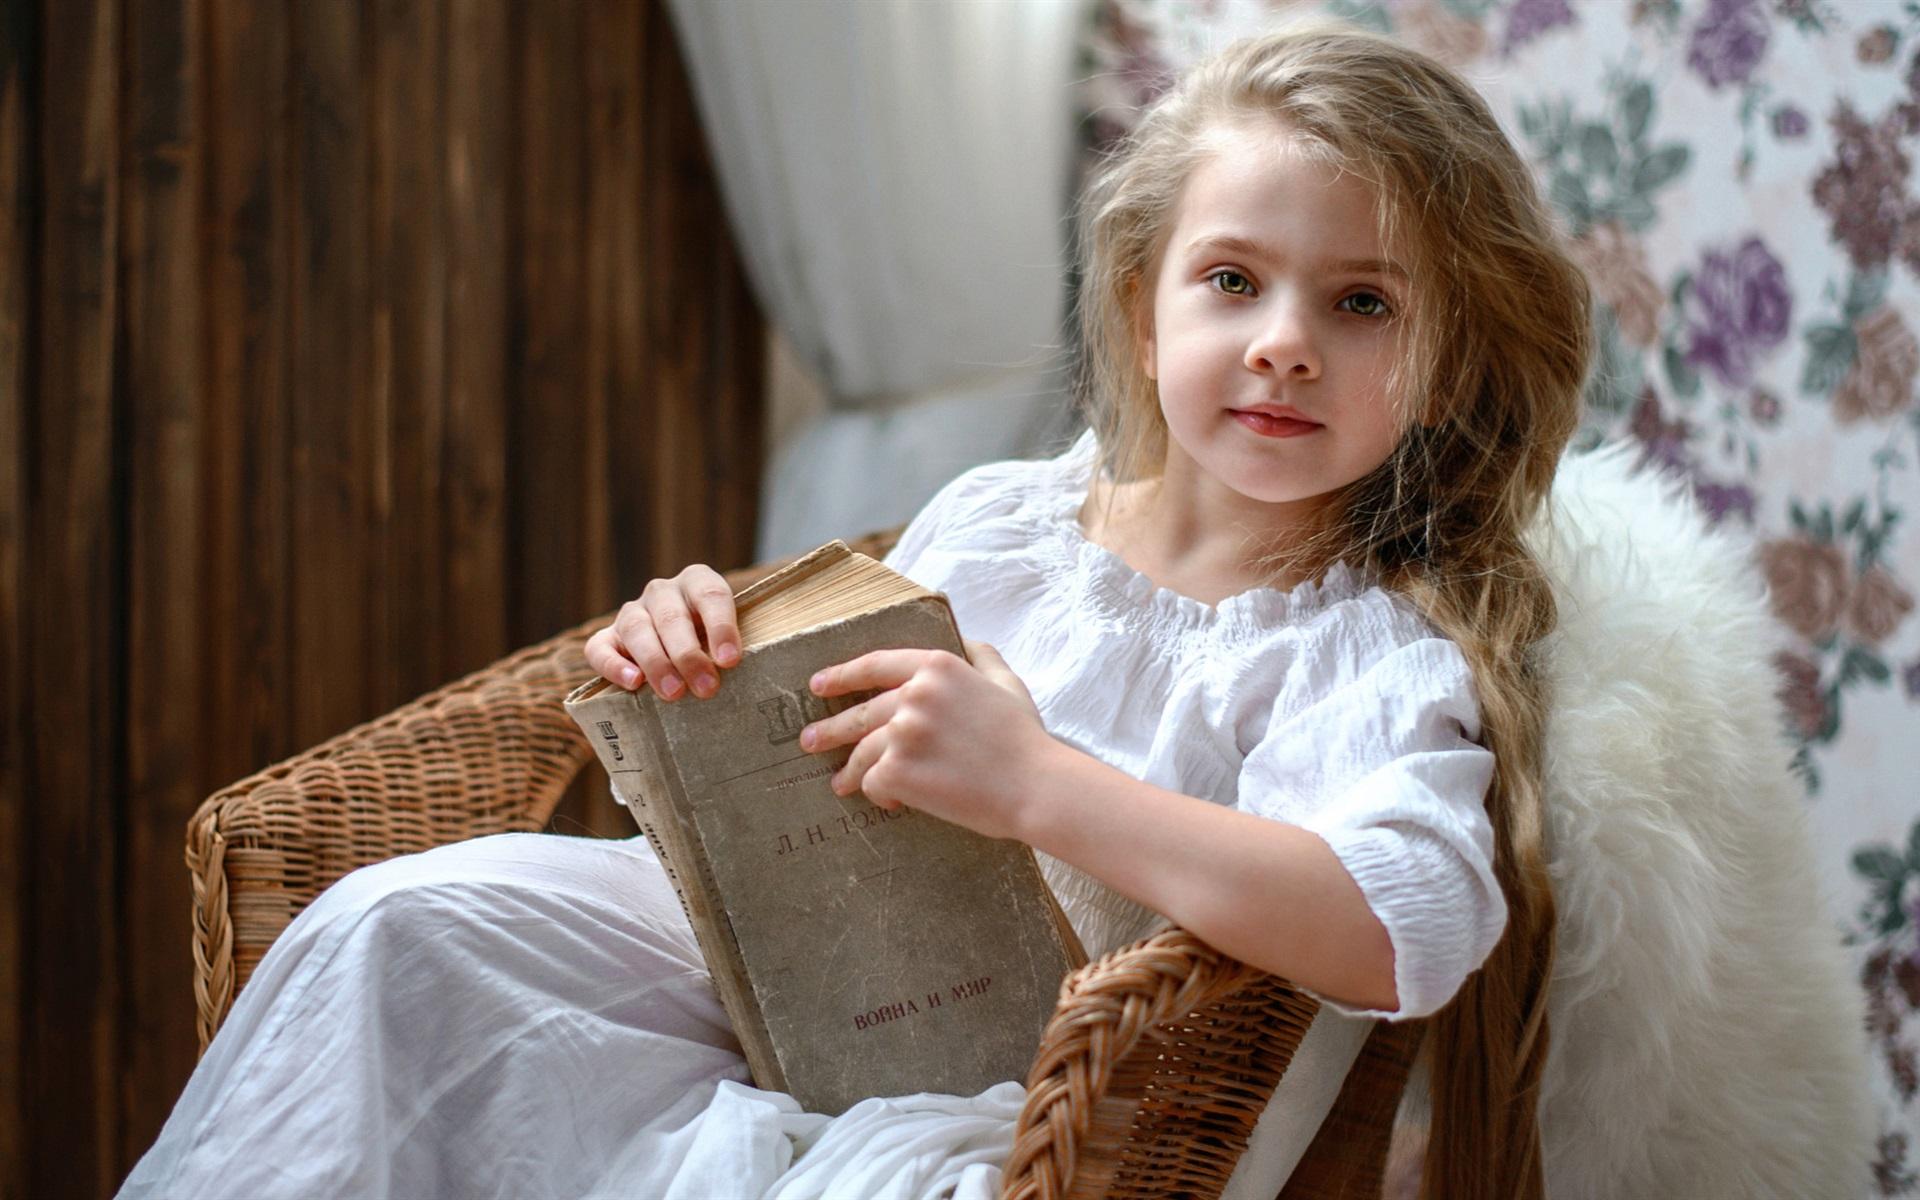 wallpaper russia cute little girl reading book 1920x1200 hd picture